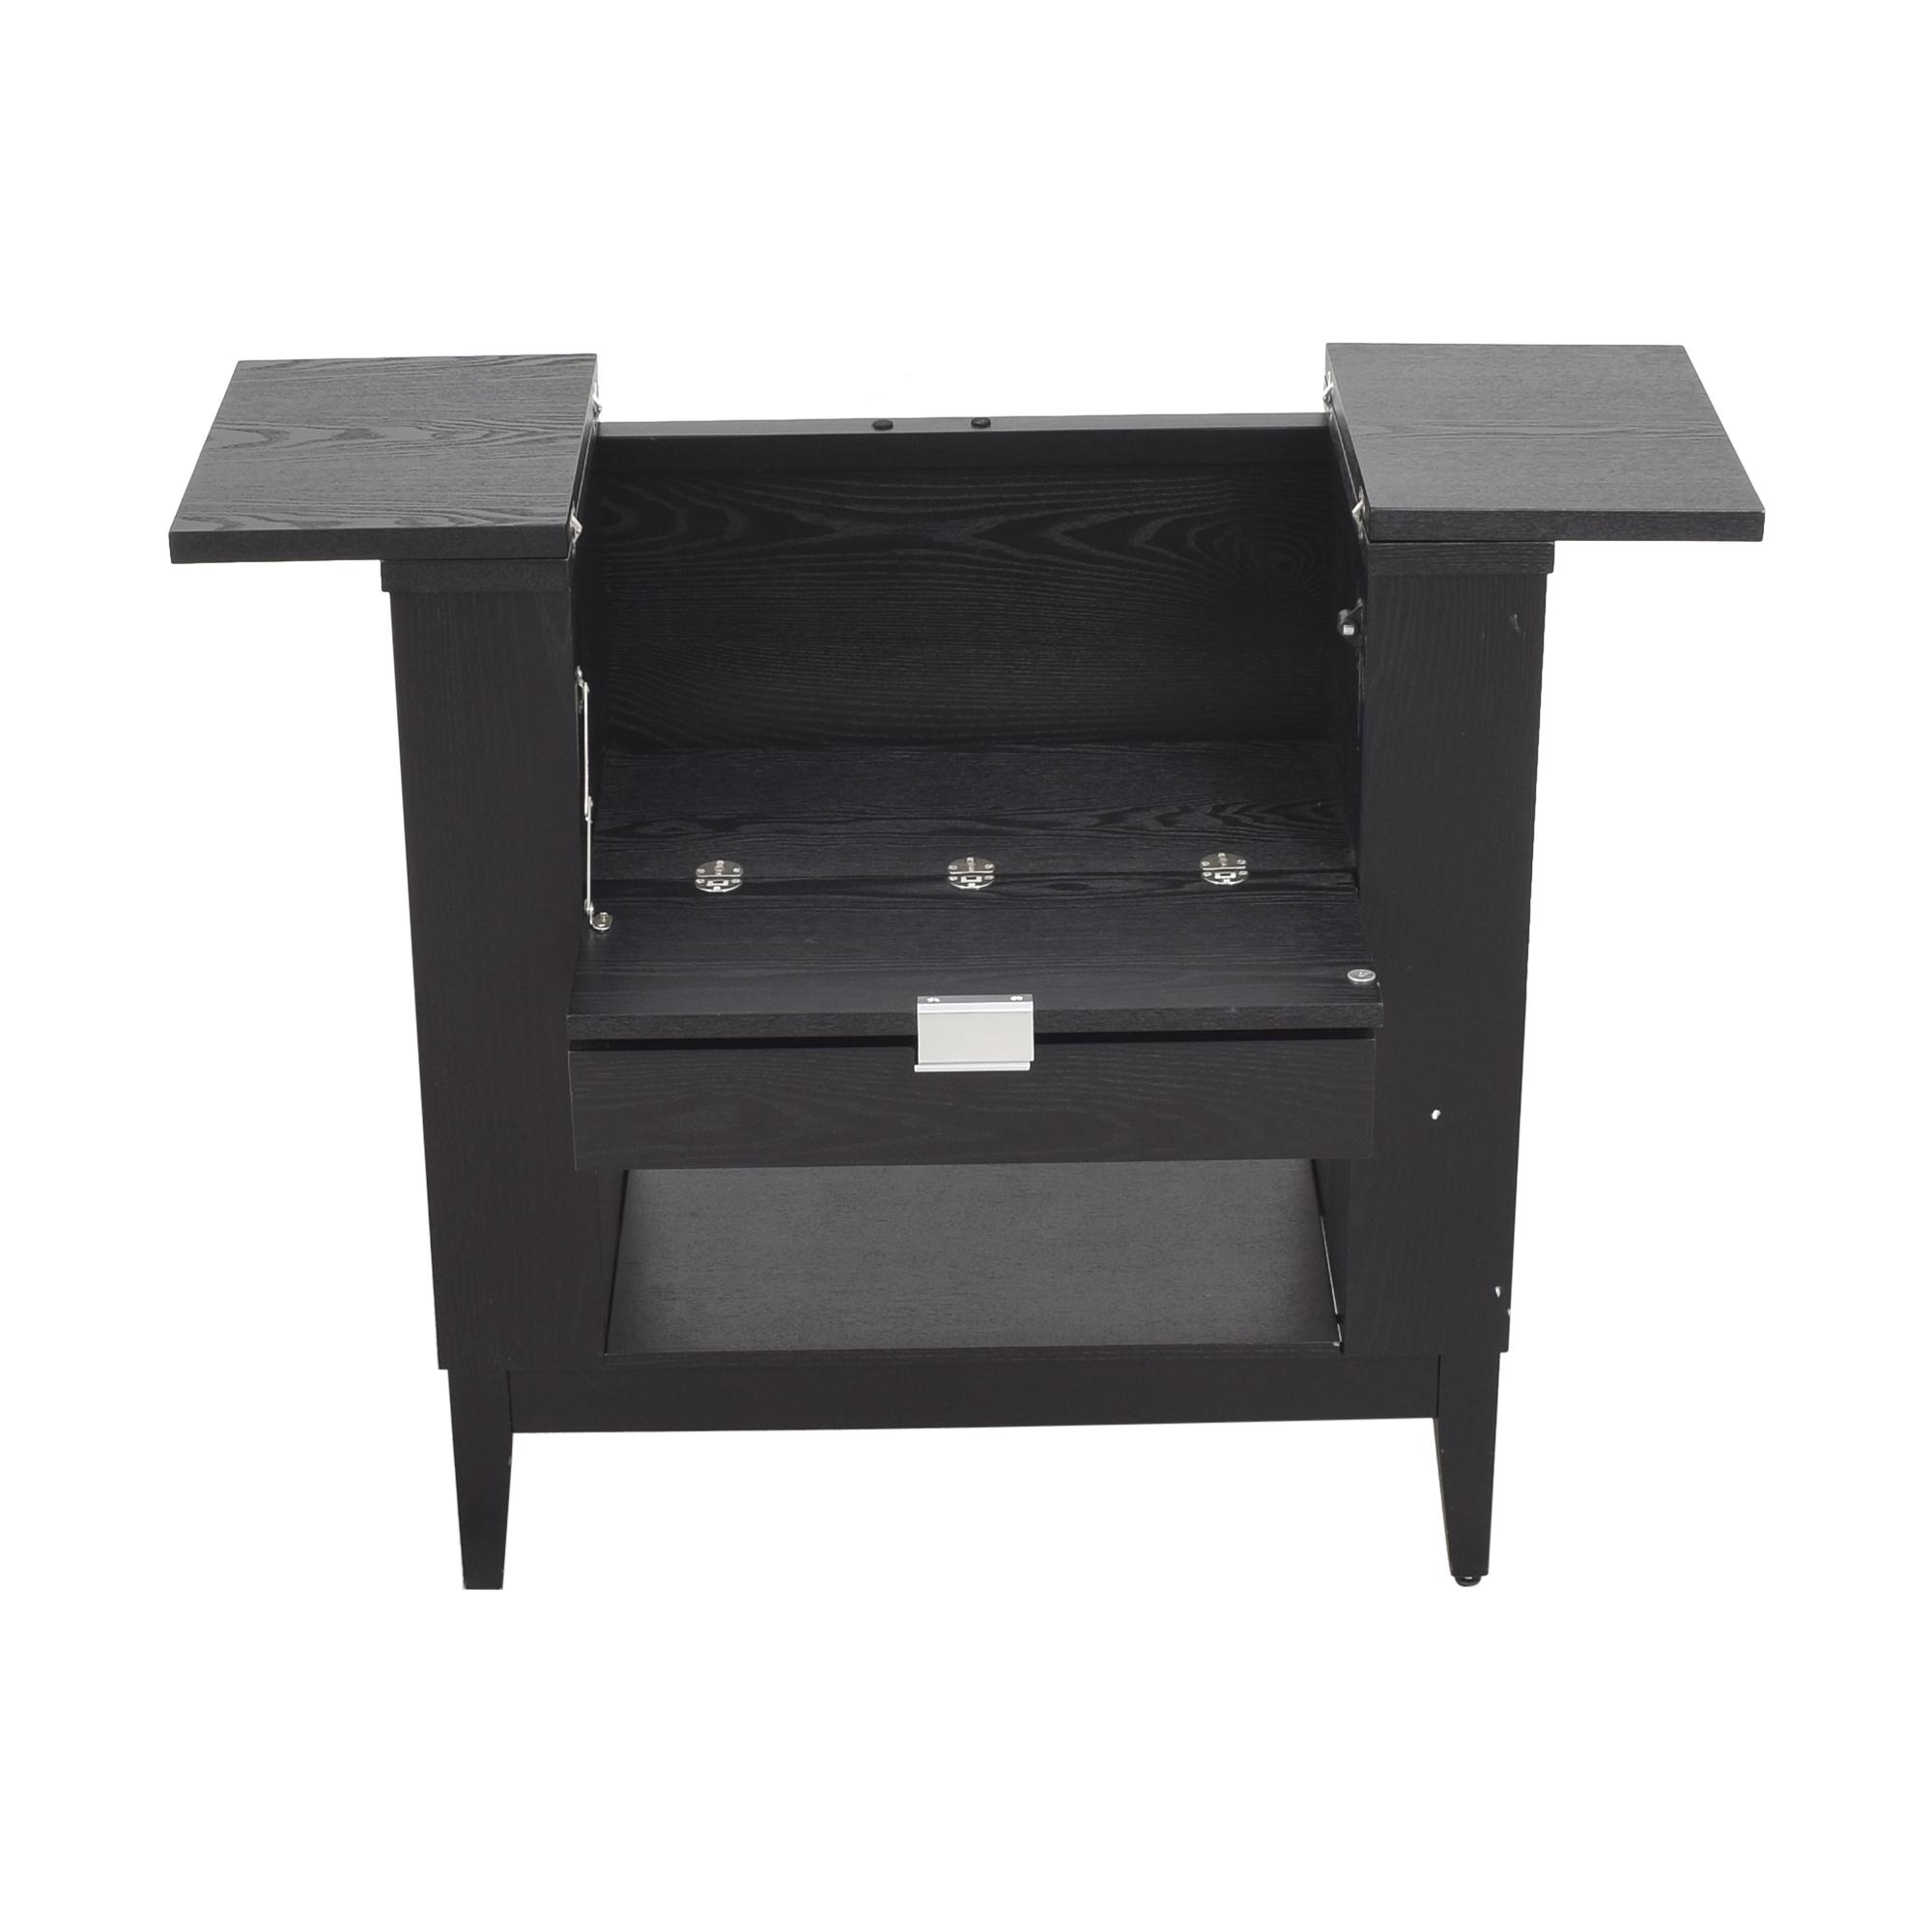 shop Crate & Barrel Crate & Barrel Parker Spirits Bar Cabinet online